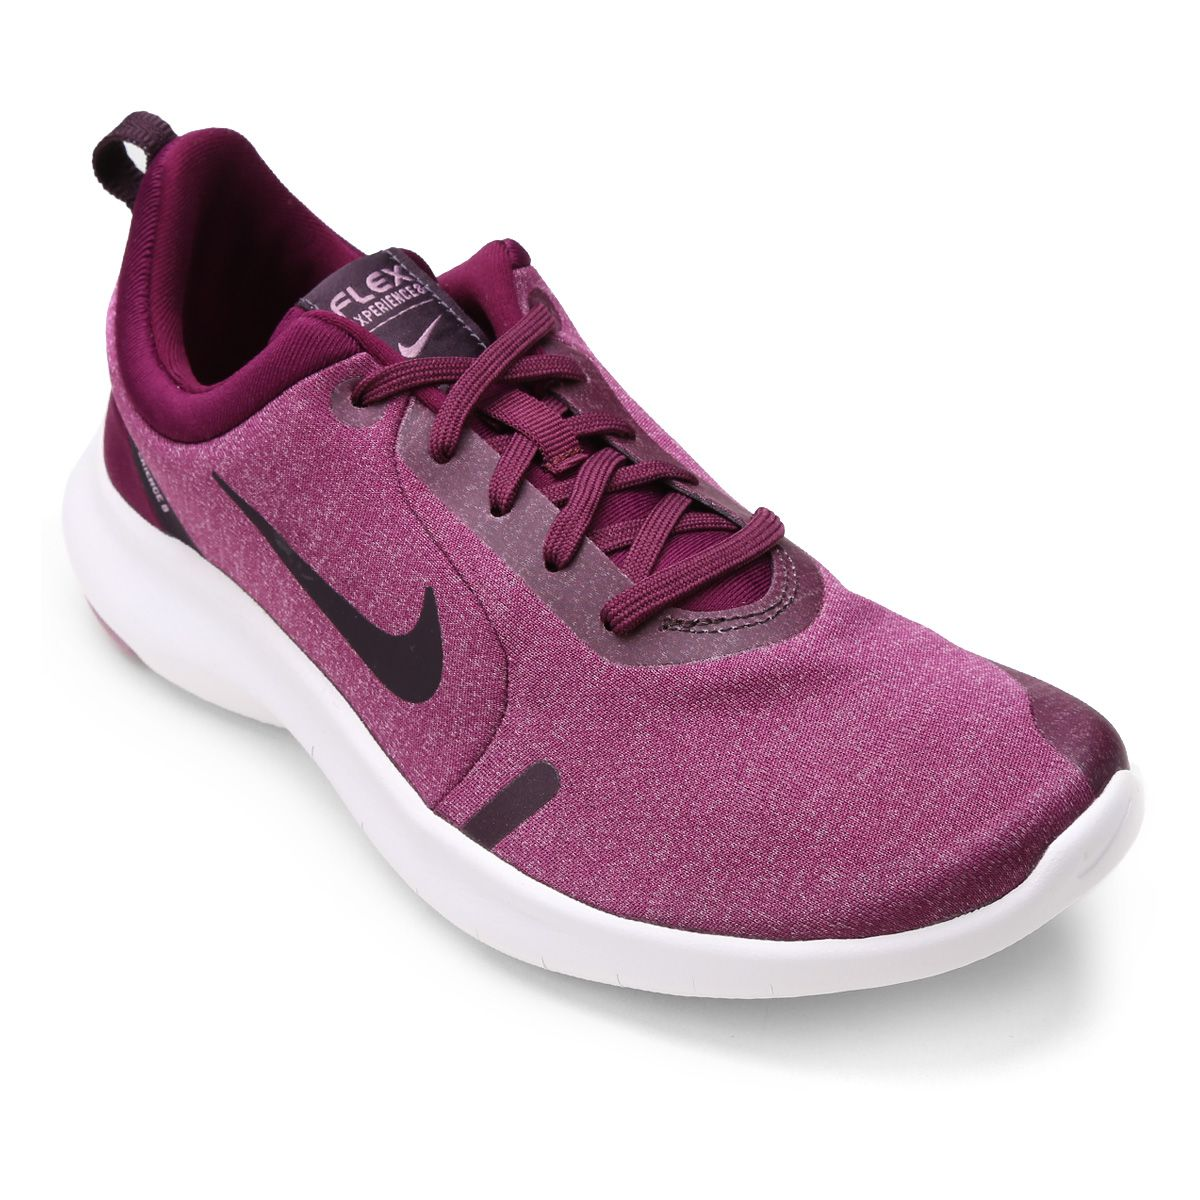 3bfe3c037 Tenis Nike Experience Casual Feminino Confortavel Original